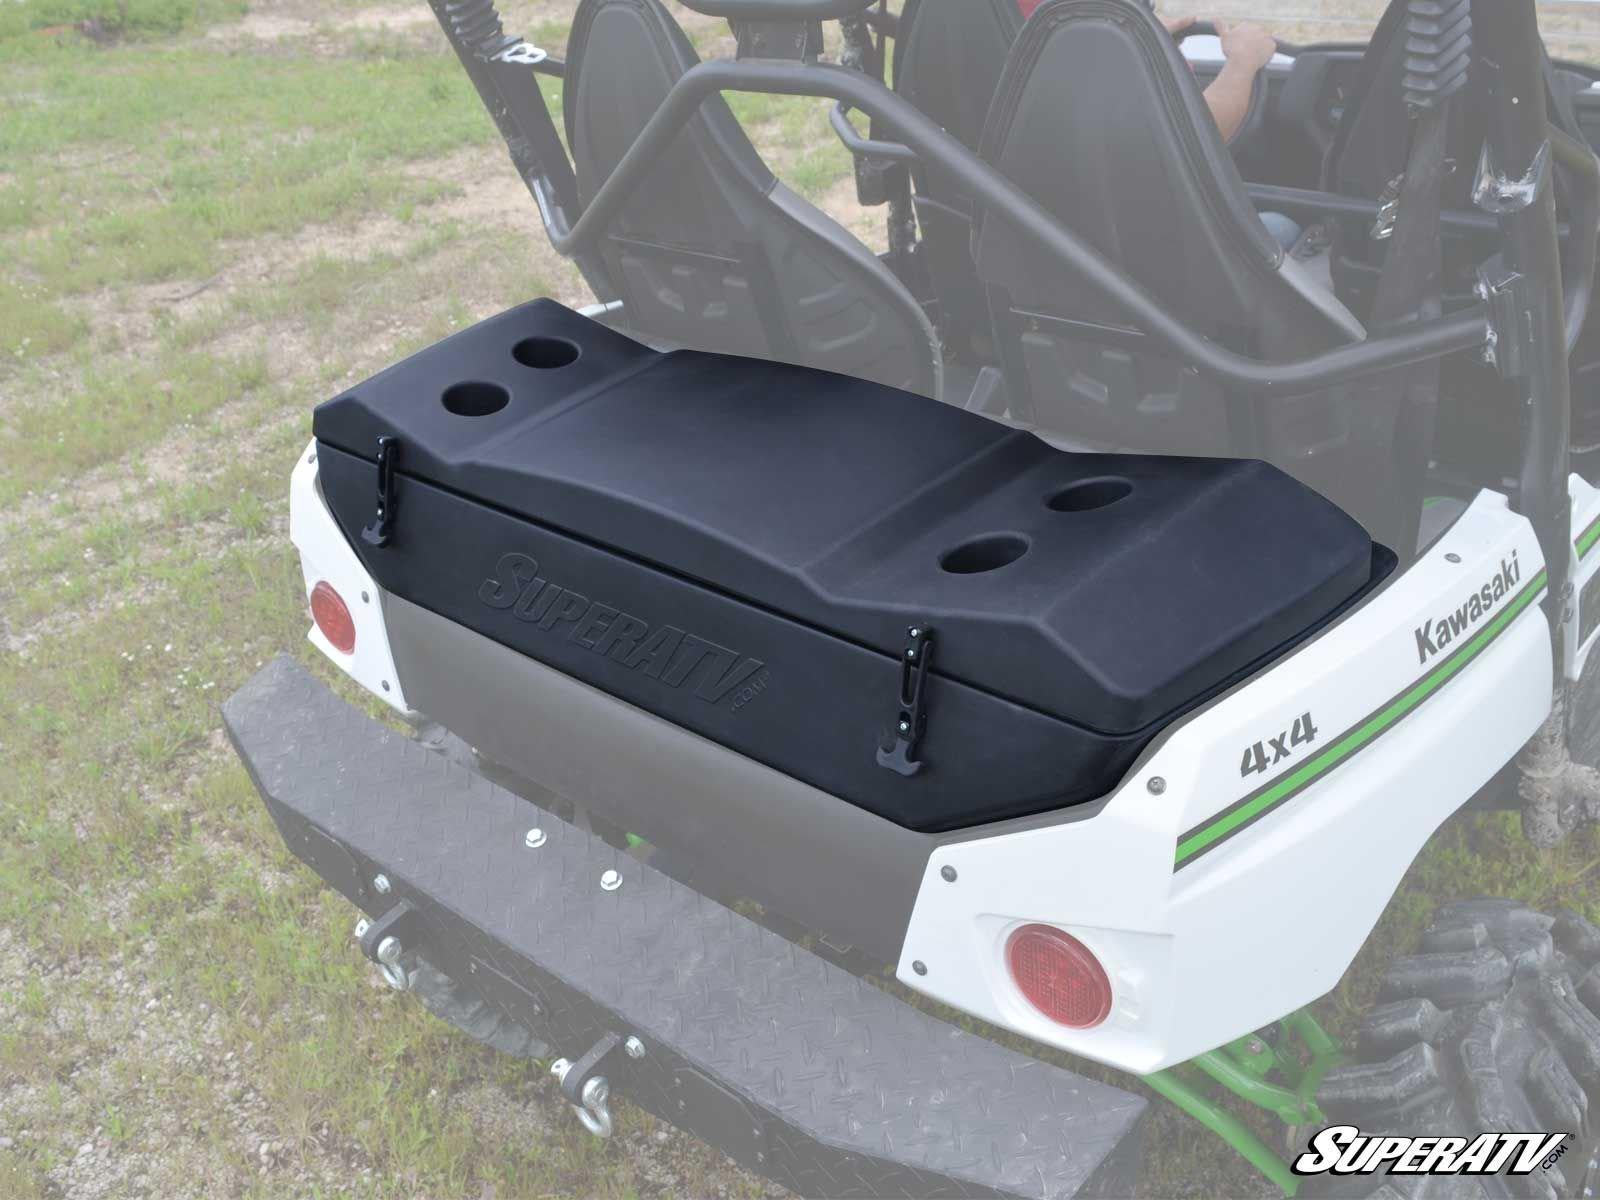 2012-2016 Kawasaki Teryx 4 Dual Compartment Cooler/Cargo Box by Super ATV RCB-K-TRX4-30